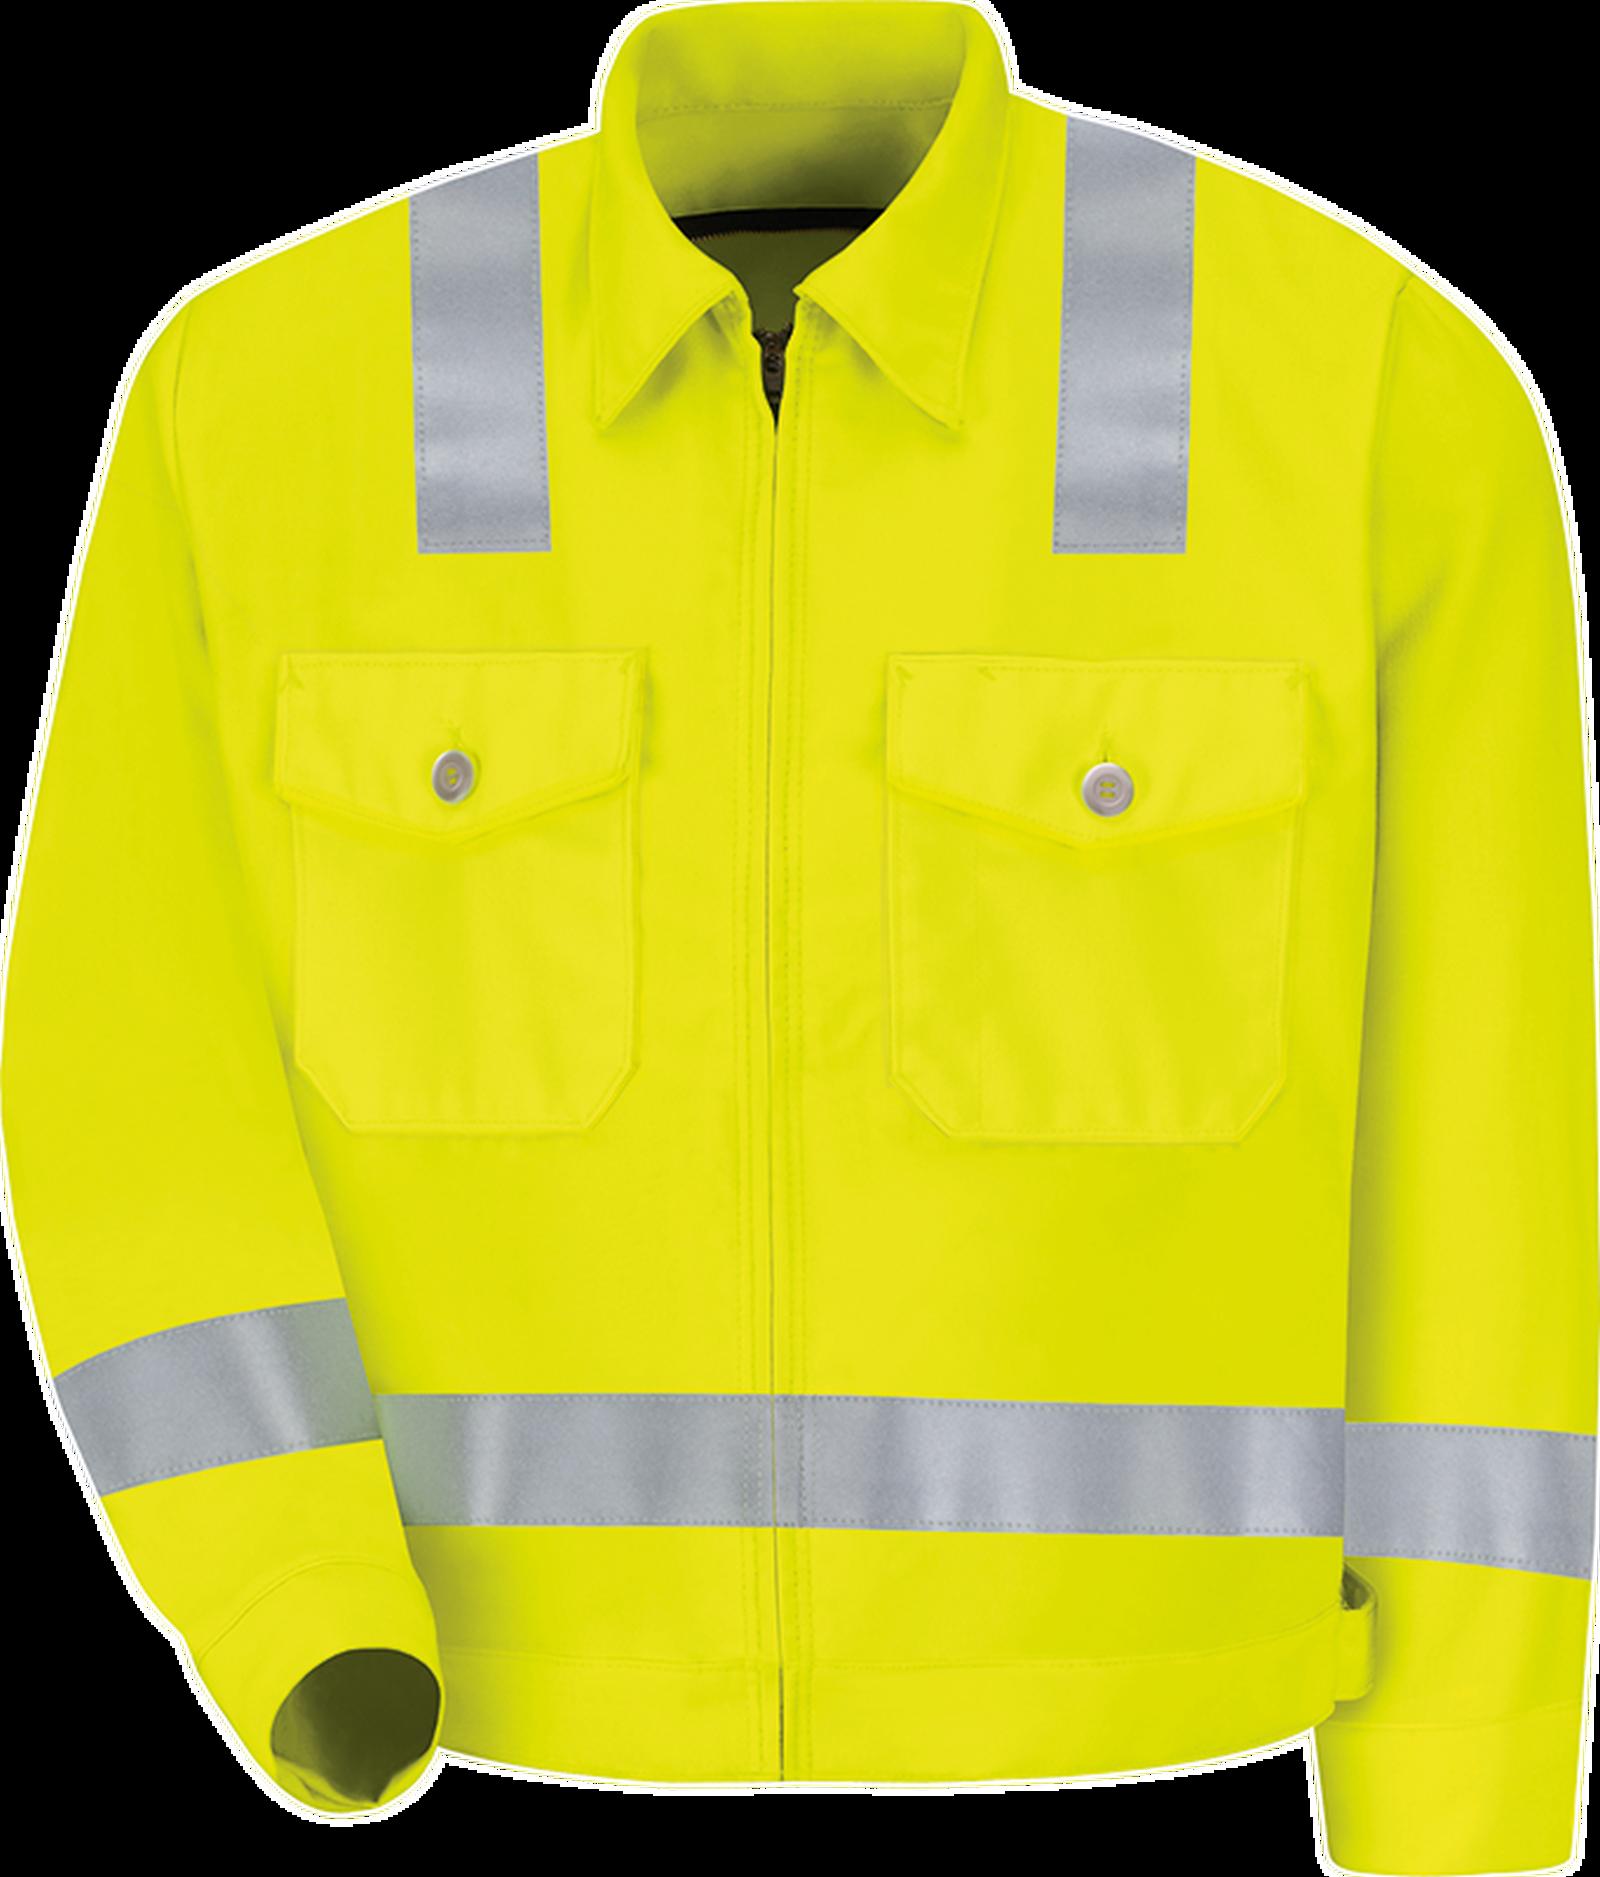 Hi-Visibility Jacket - Type R Class 2